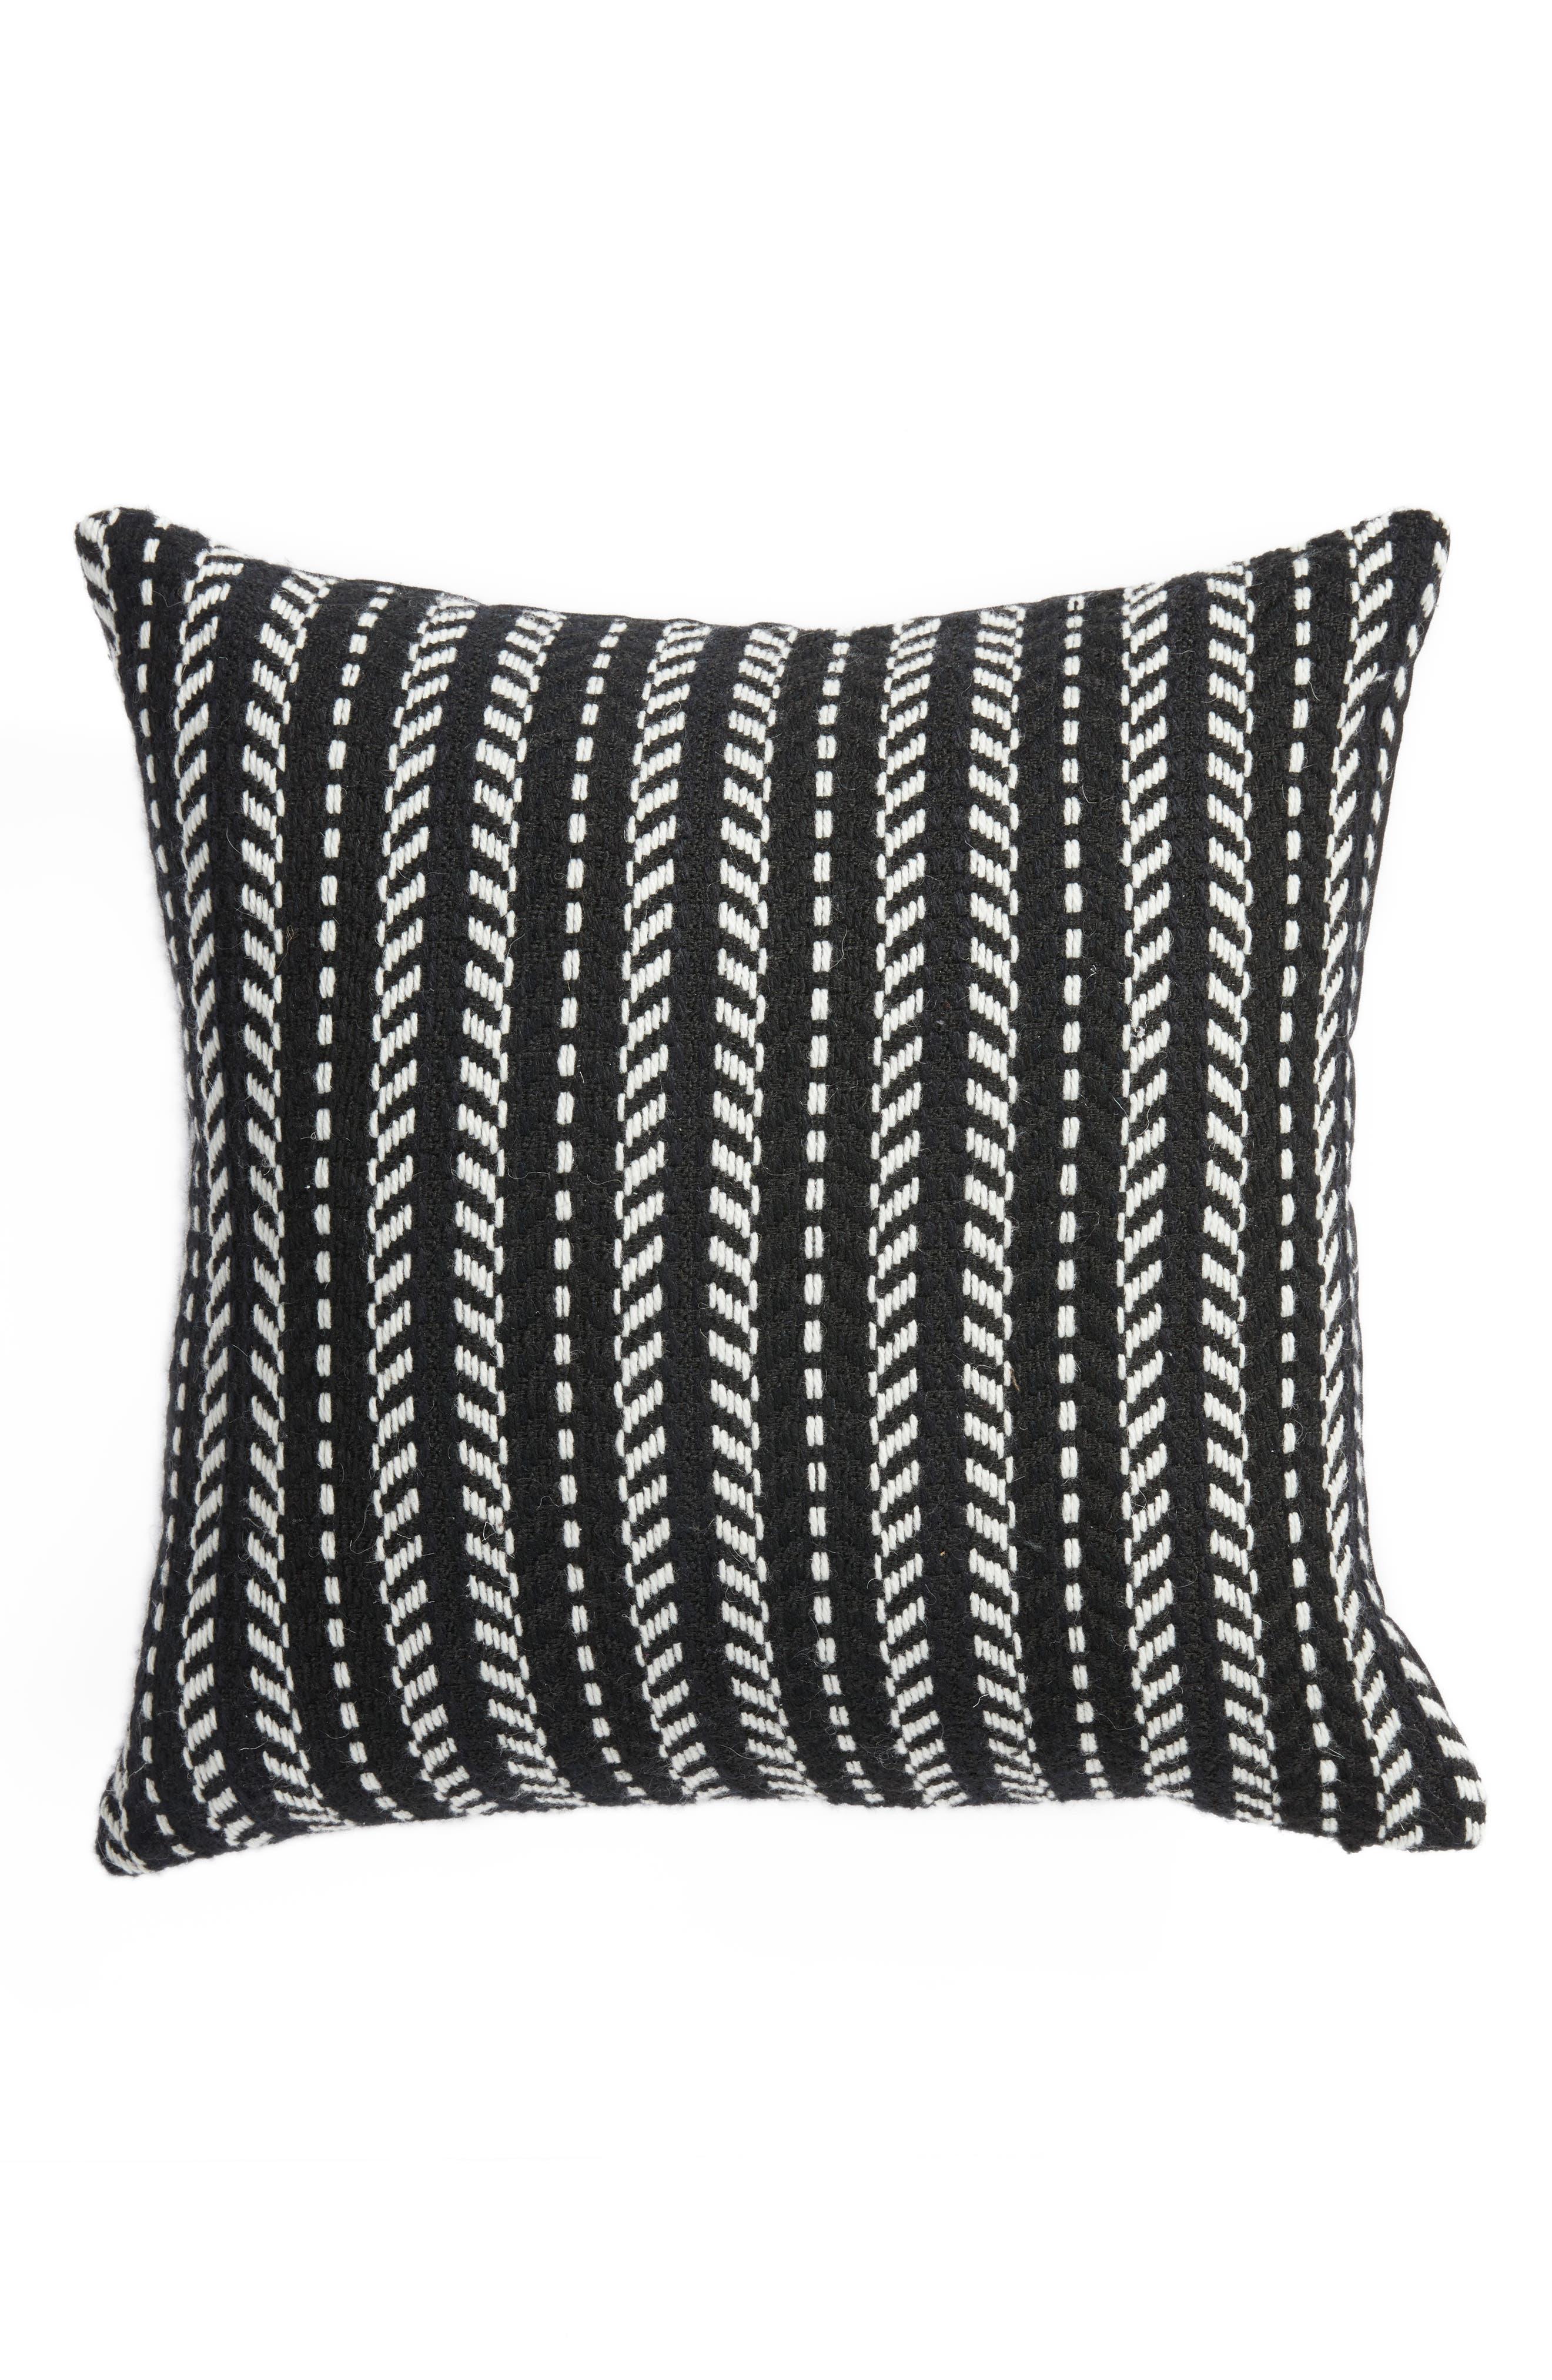 Levtex Moroccan Woven Pillow